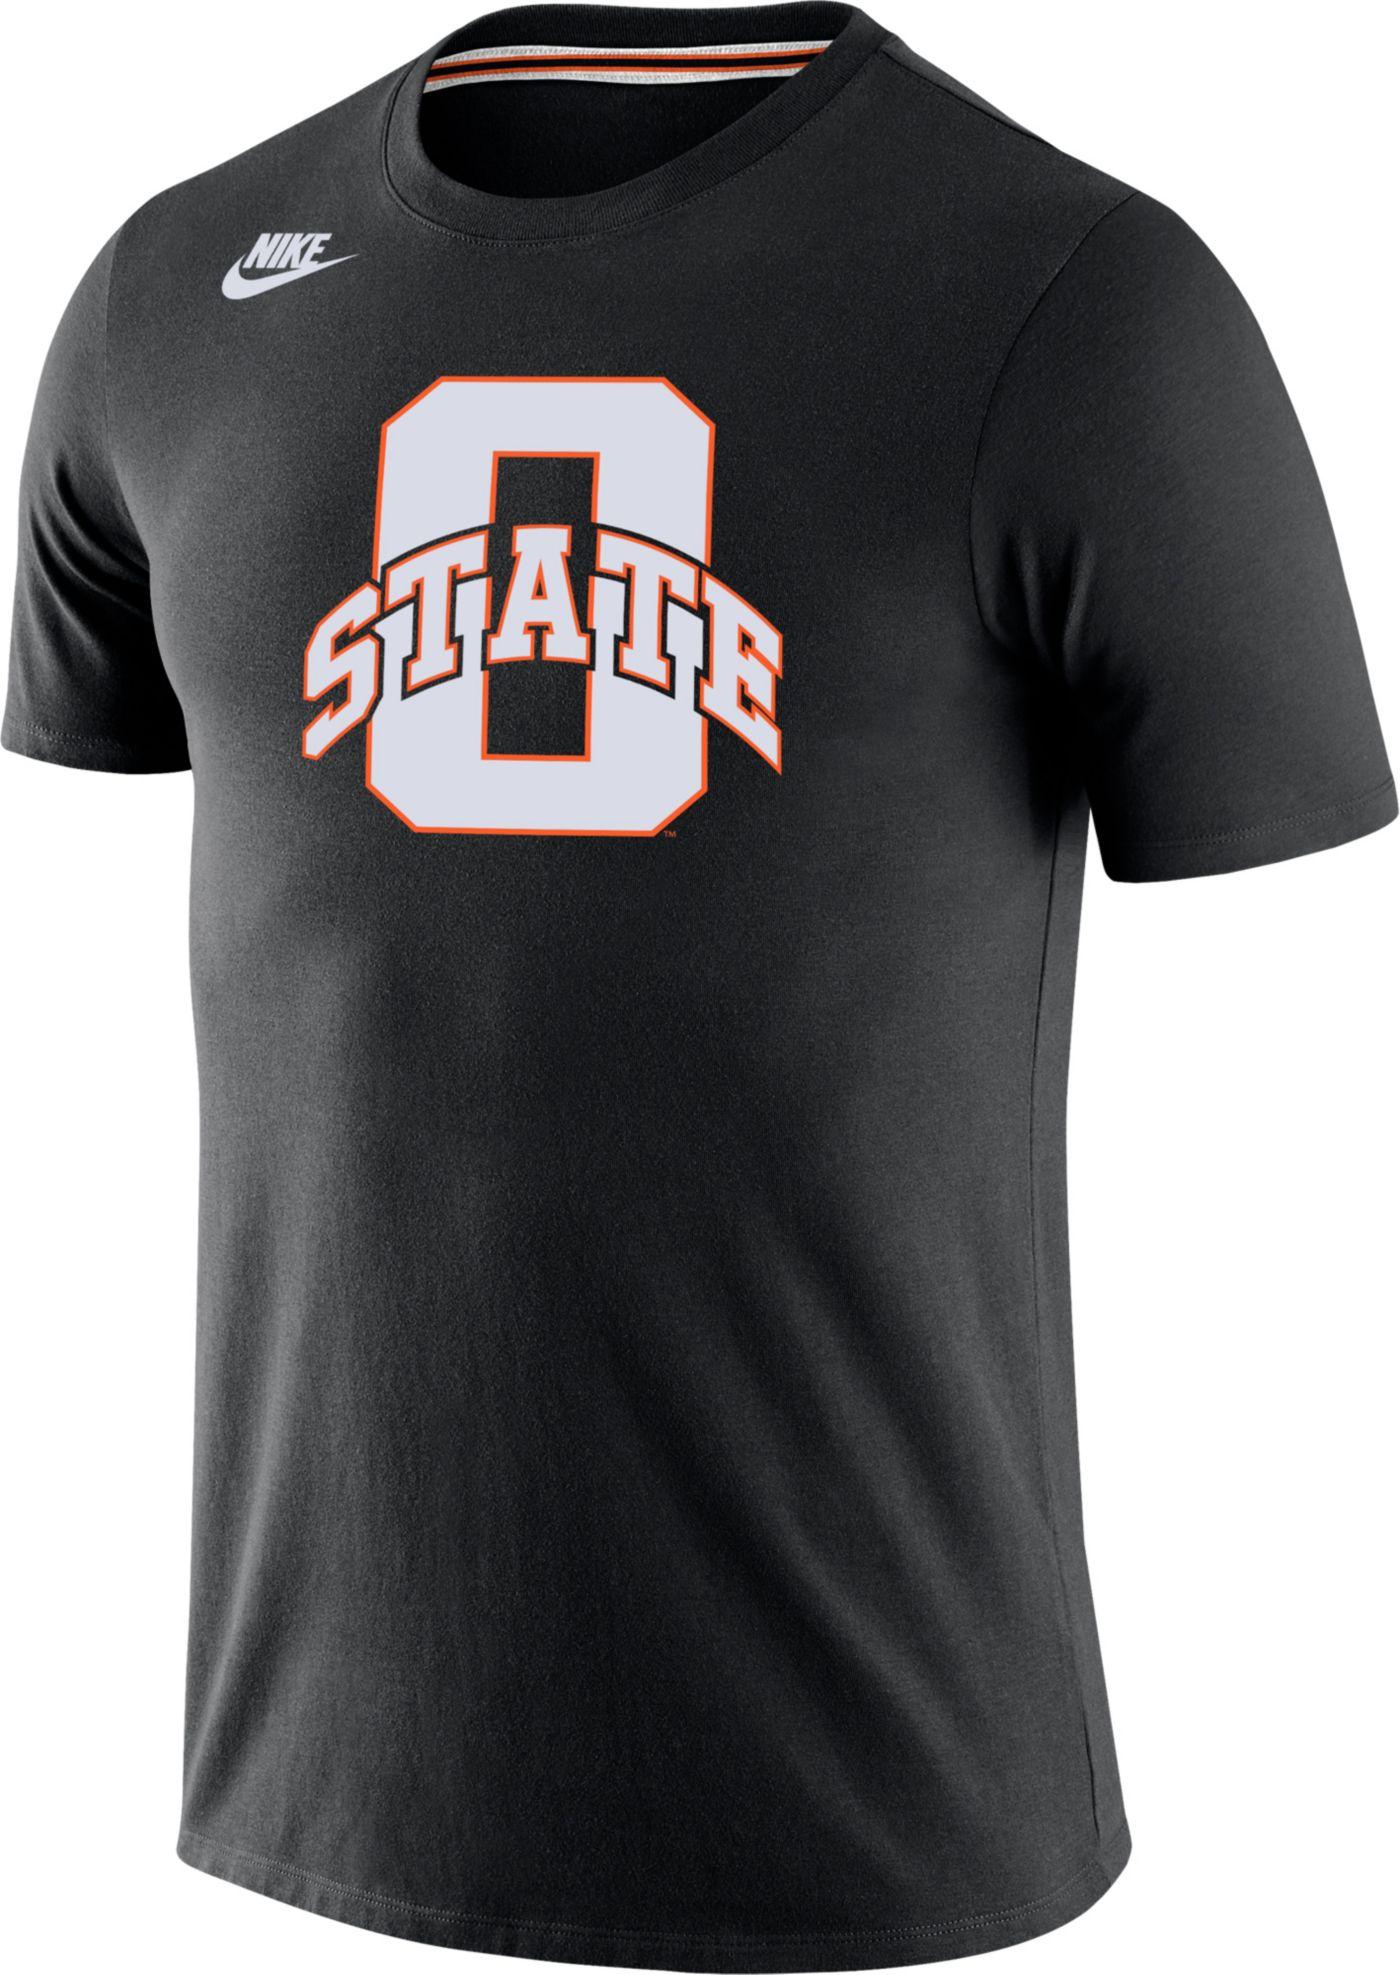 Nike Men's Oklahoma State Cowboys Tri-Blend Retro Black T-Shirt